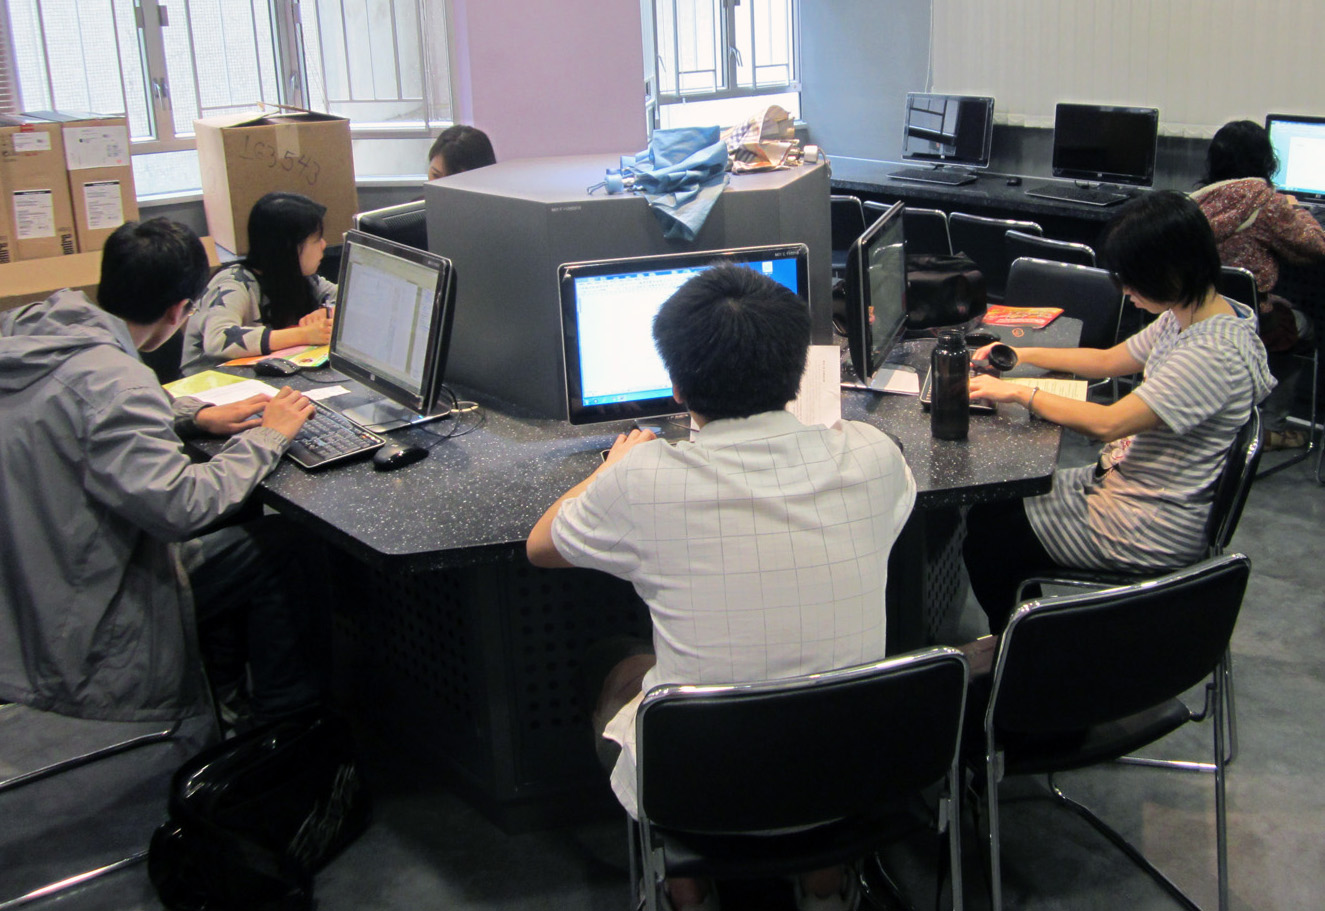 "<a href=""http://mblcc.org.hk/?page_id=1681"">輔導就業及陽光路上培訓計劃</a>"